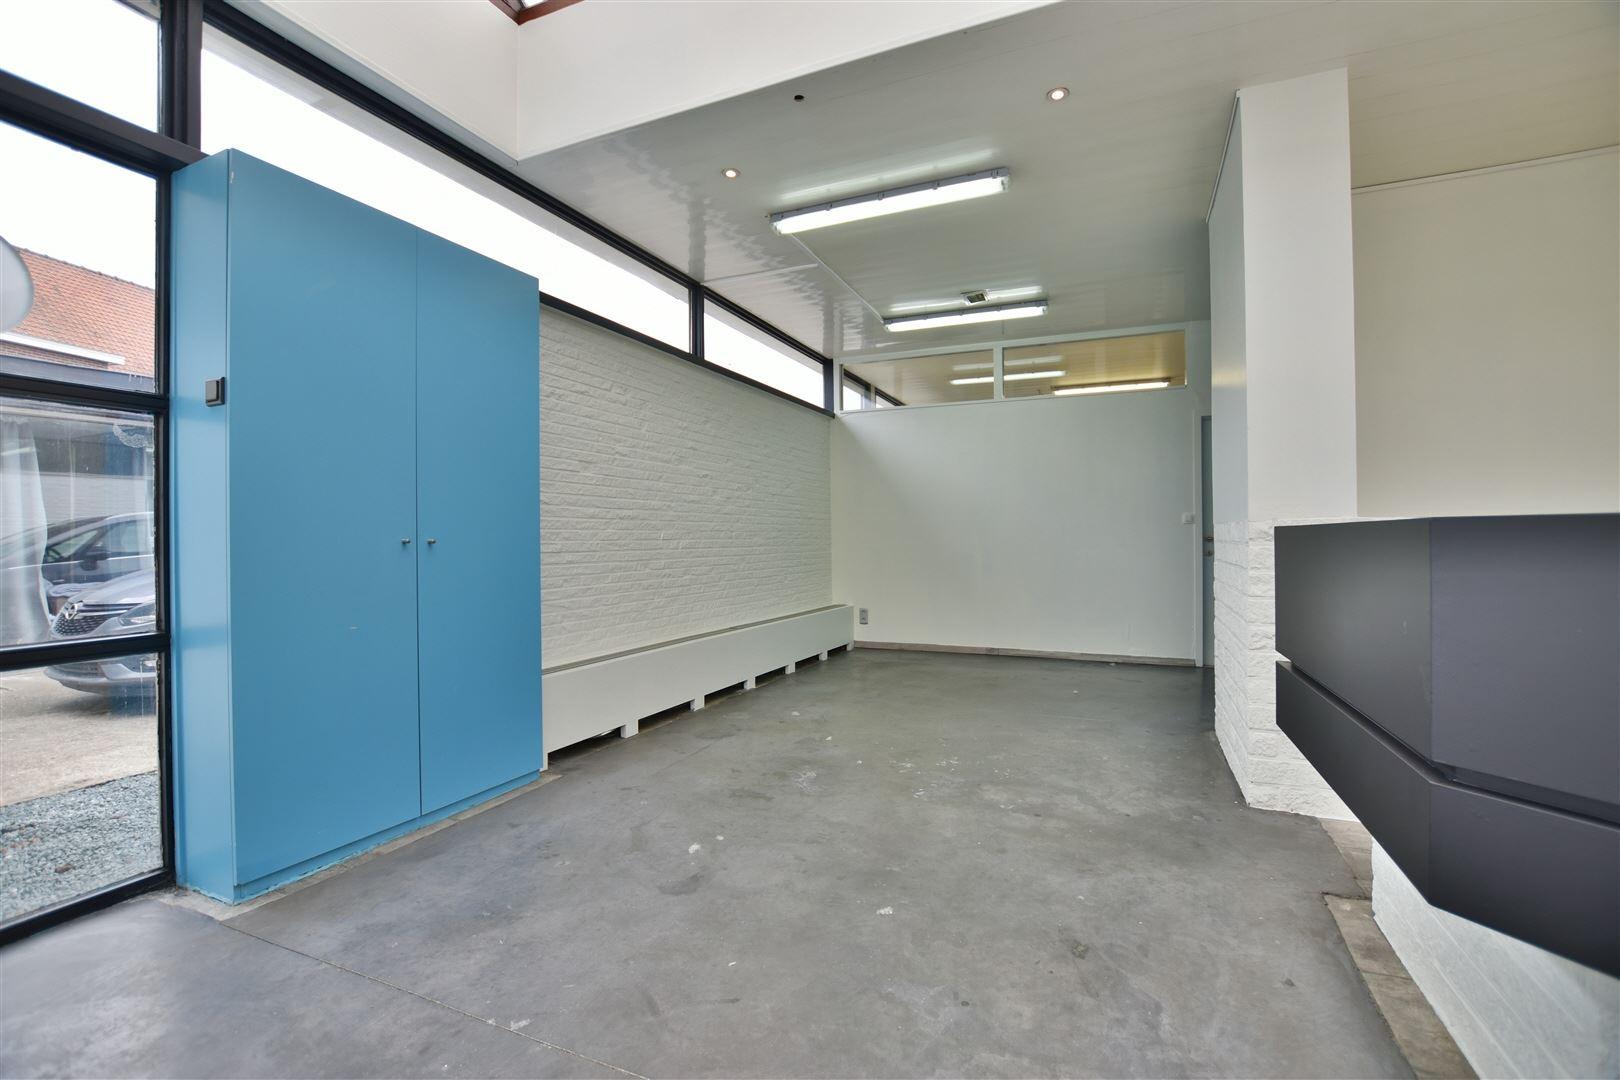 Foto 5 : Kantoorruimte te 9220 HAMME (België) - Prijs € 1.600